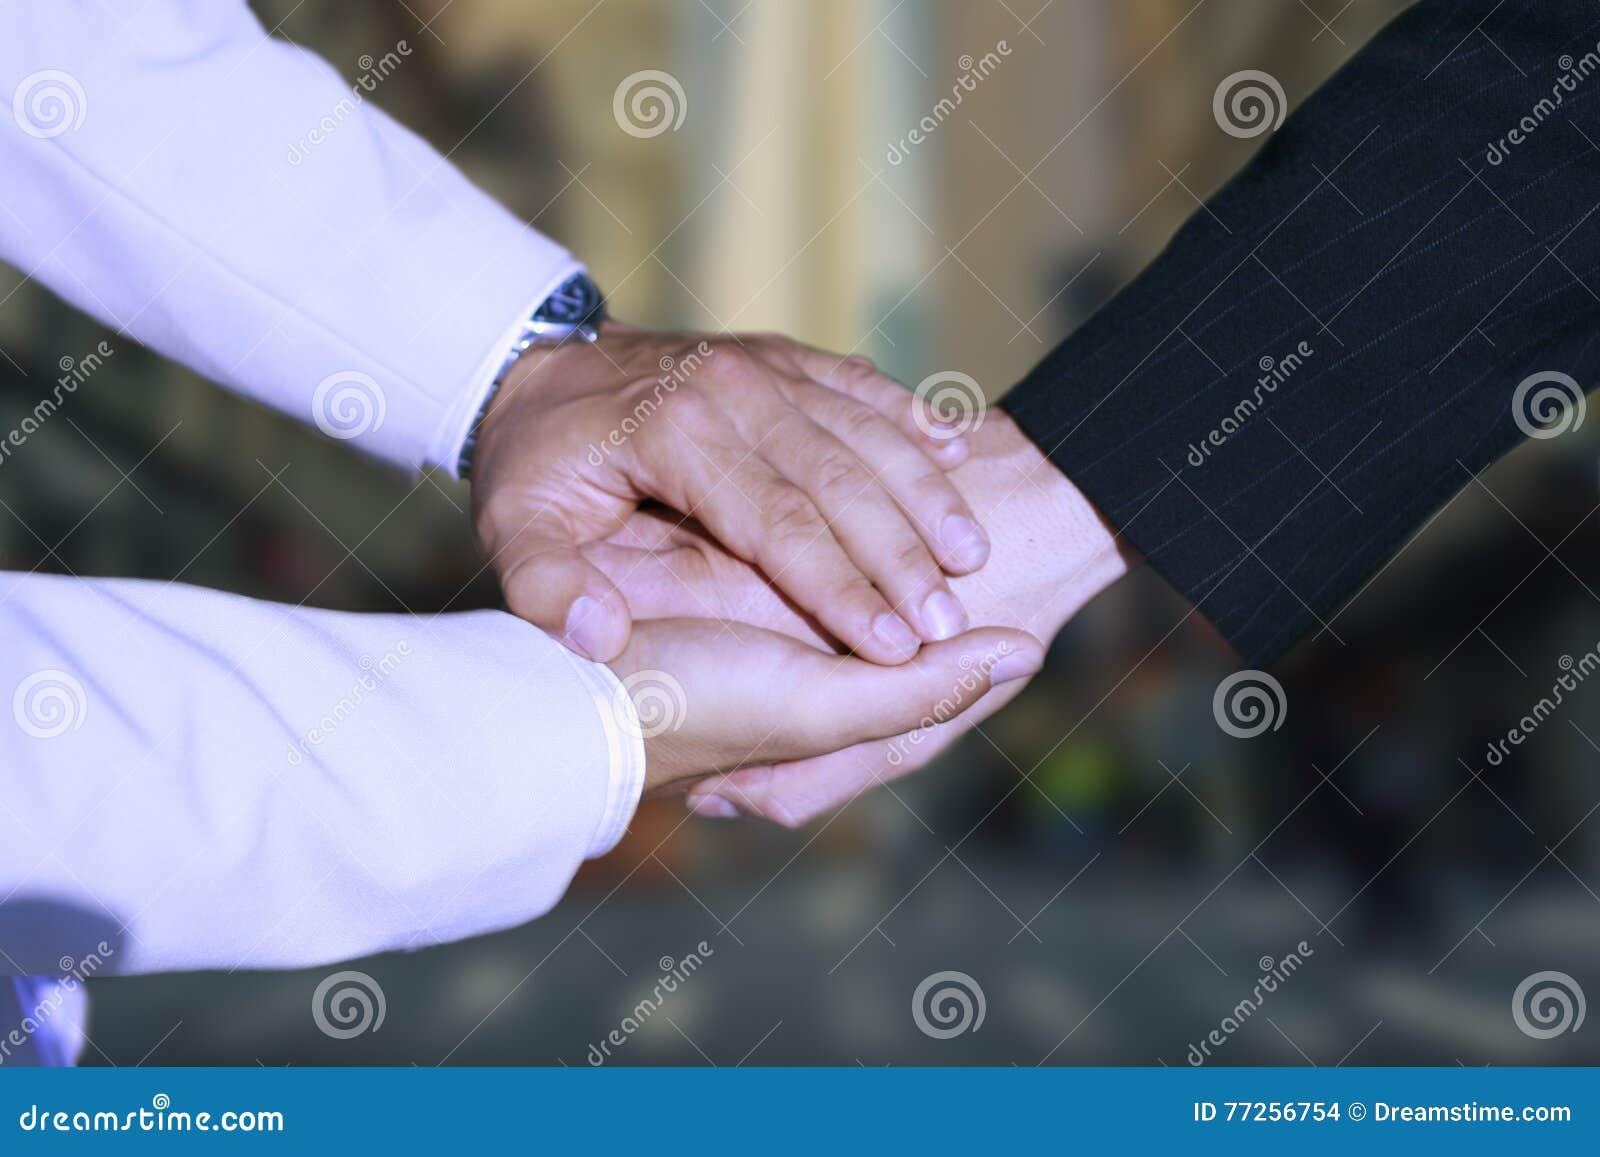 Prise de contact - fixation de main